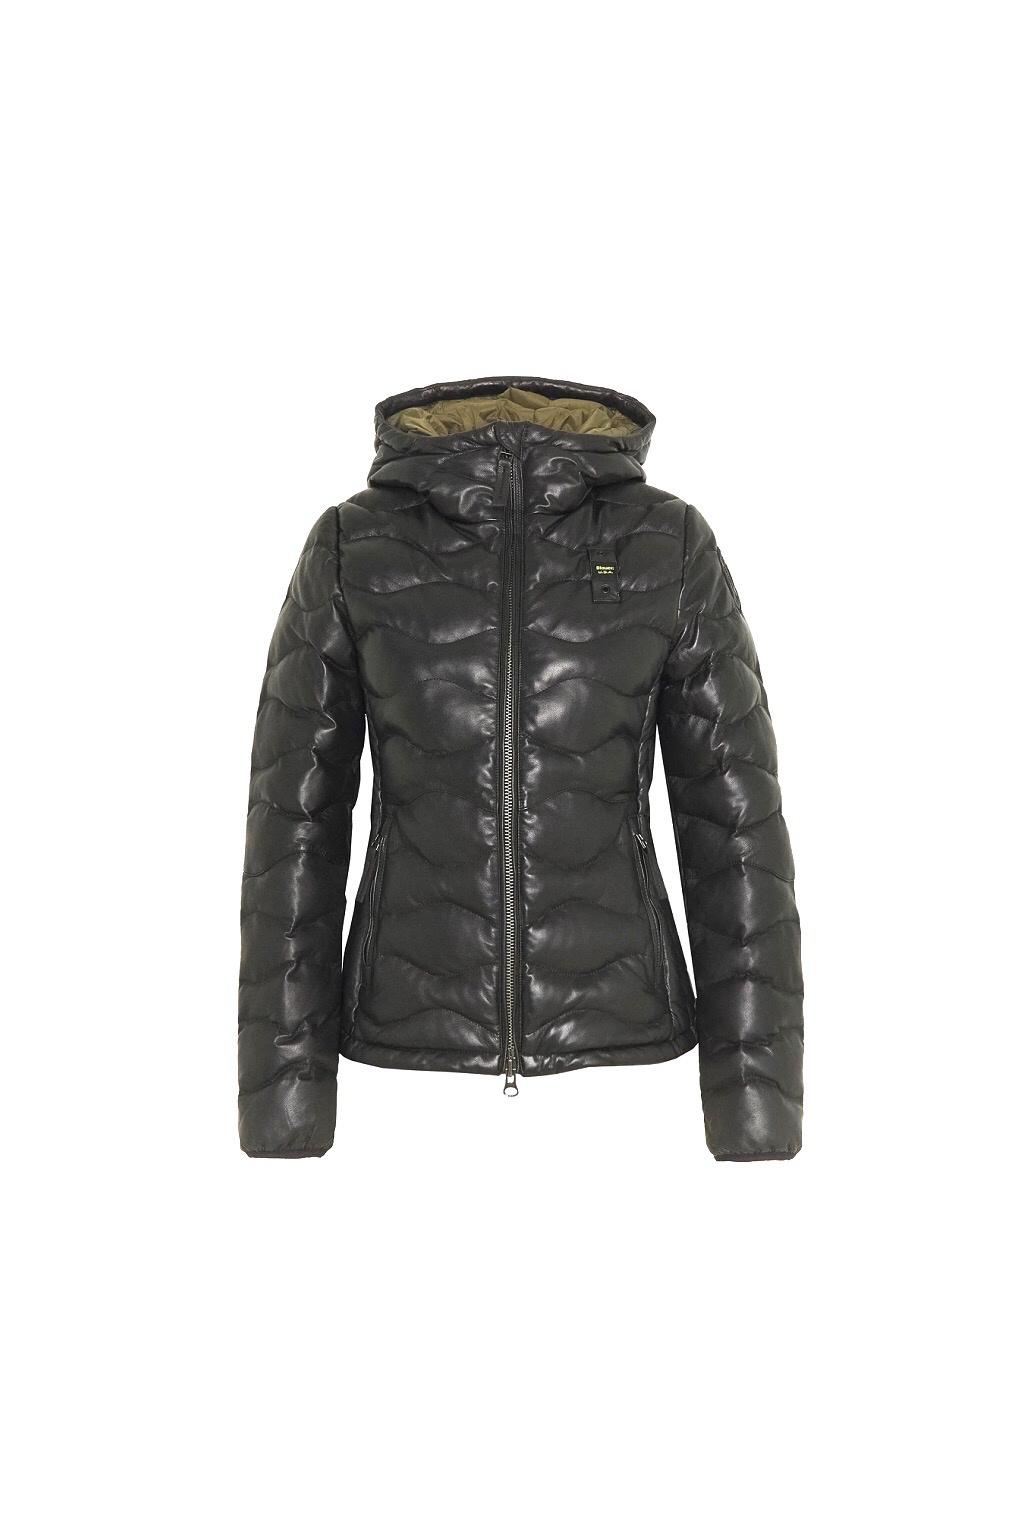 20WBLDL01143 005519 999 Dámská kožená bunda Blauer černá